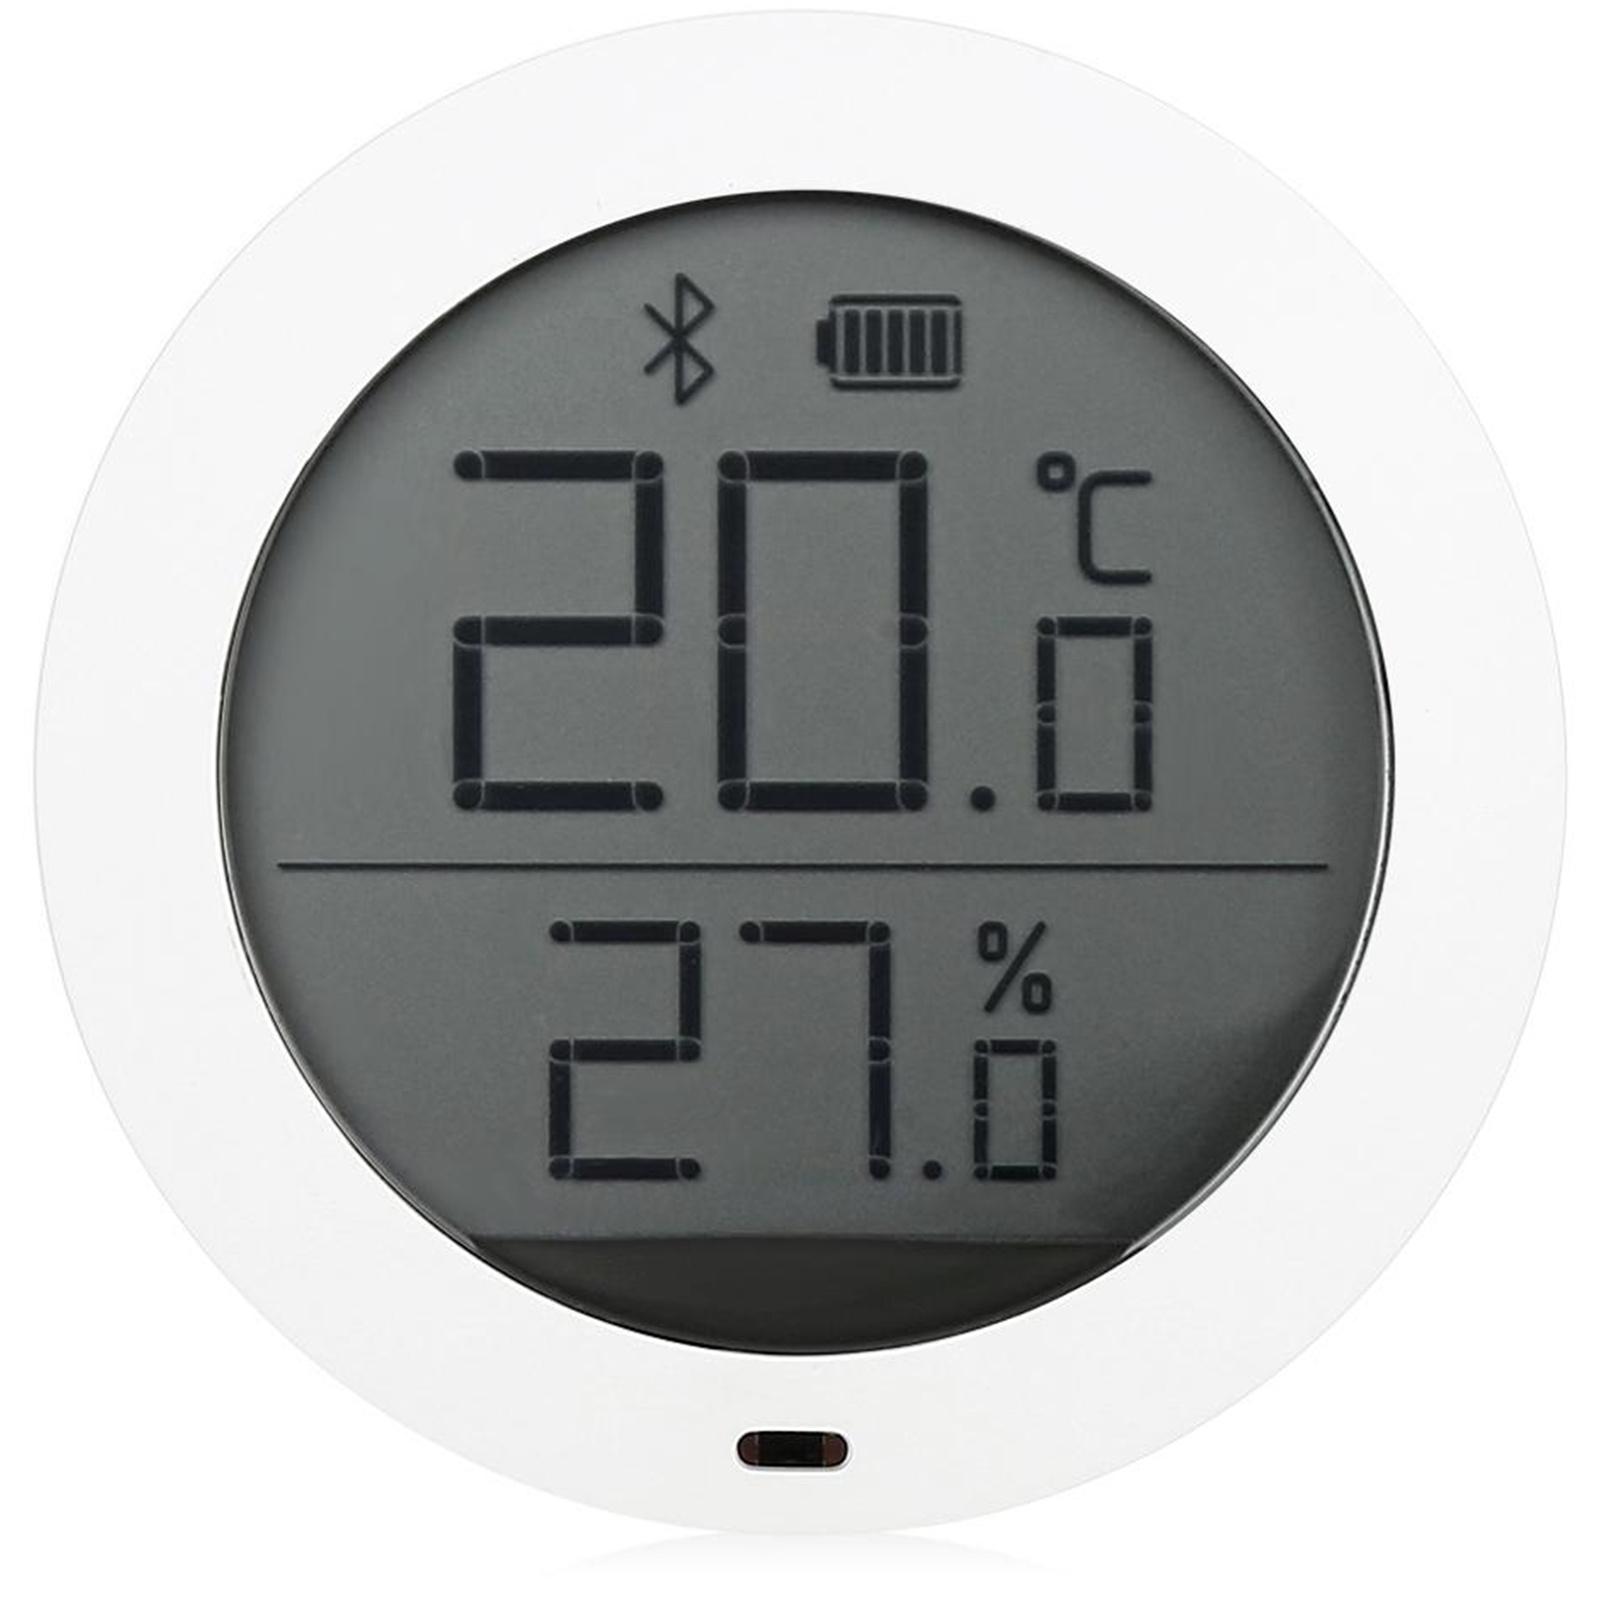 Buy the Xiaomi Mi Home Monitor Temperature & Humidity Thermostat